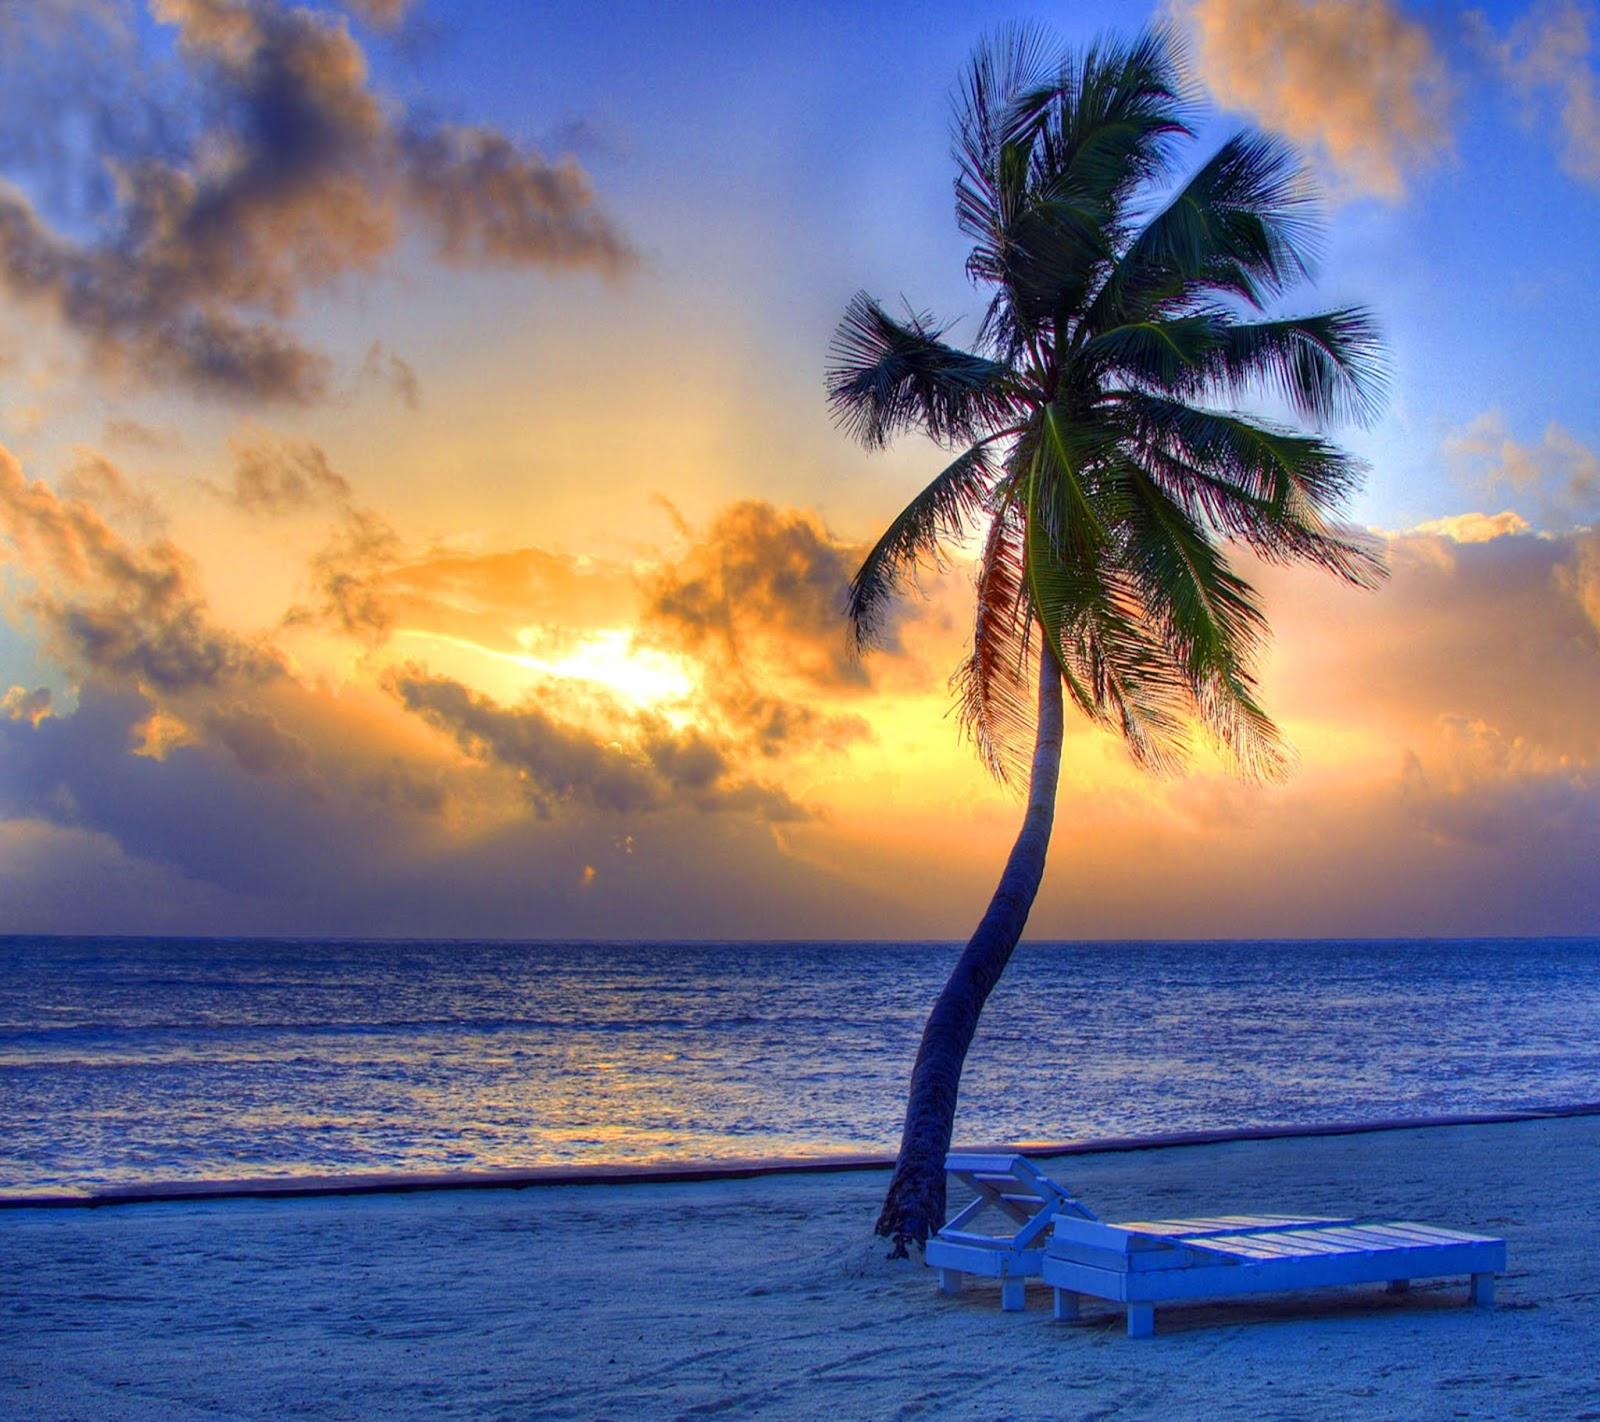 Kata Kataku Gambar Wallpaper Pemandangan Sunset Yang Indah